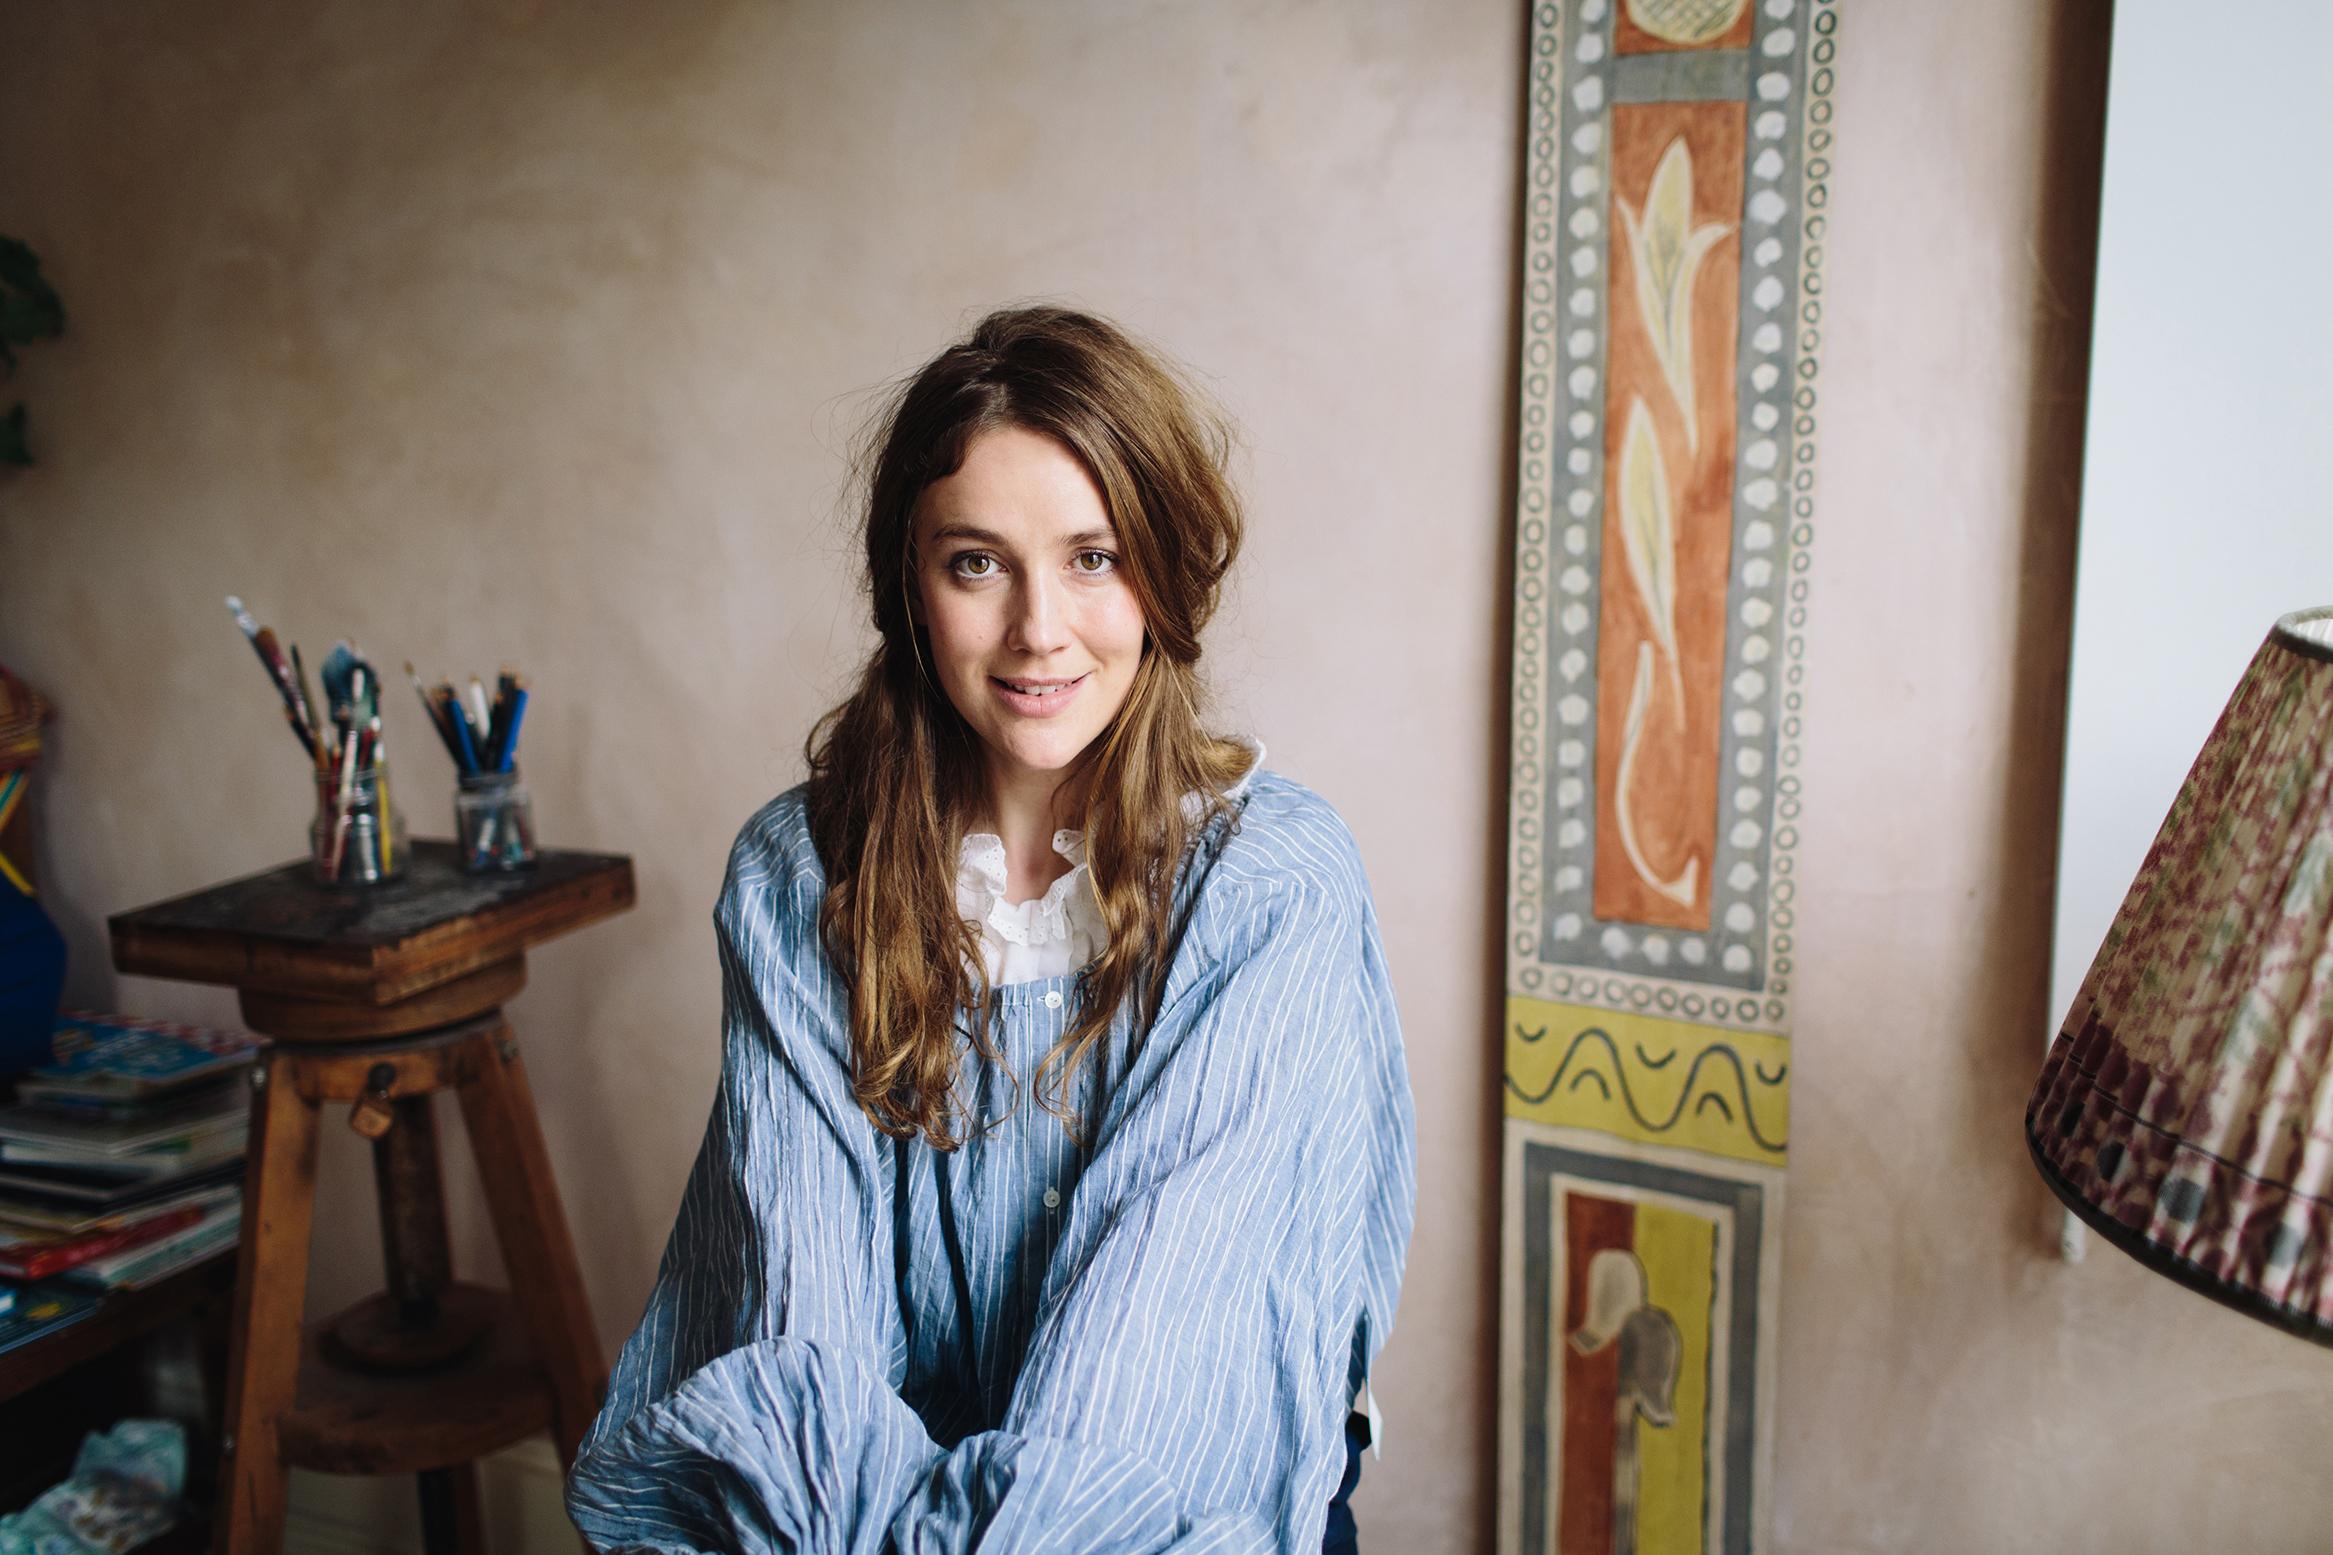 Tess Newall Studio - Lifestyle photographer Hermione McCosh